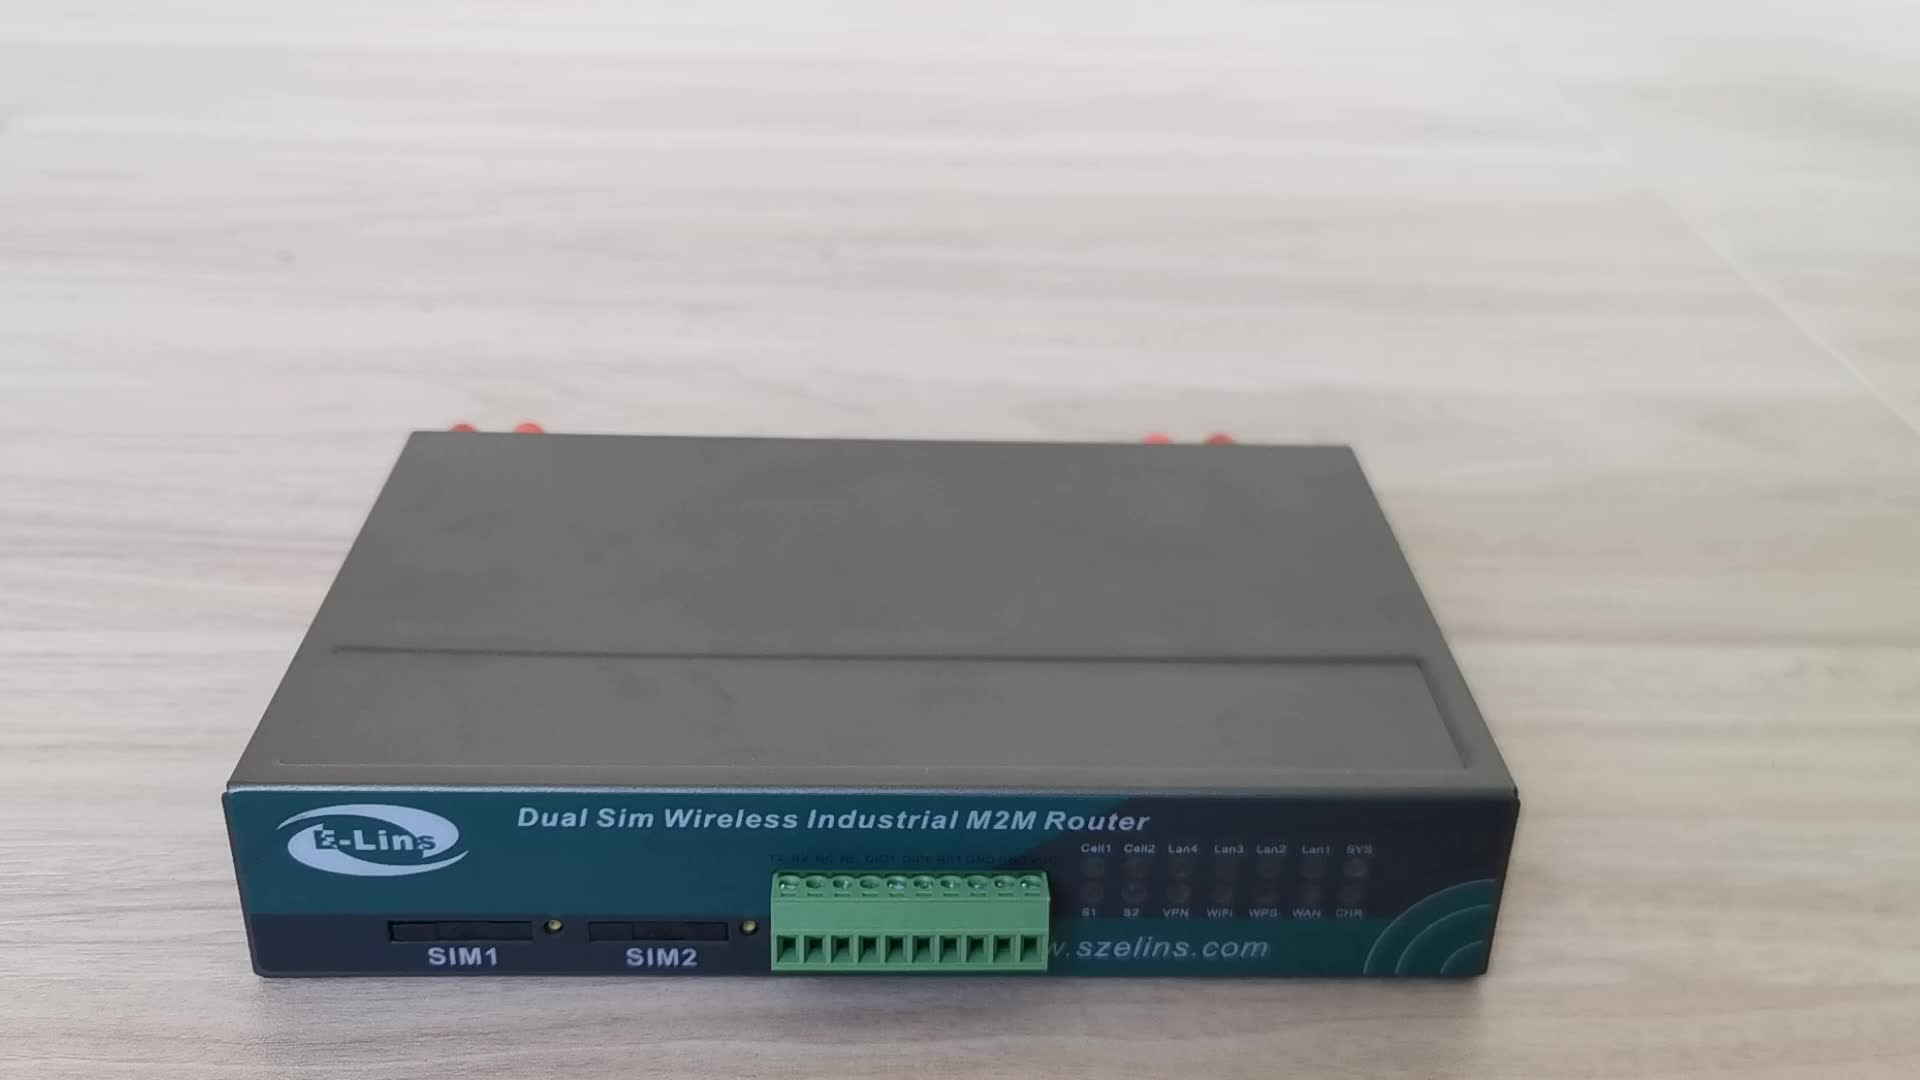 Newest H720 Serial GPS DI DO dual sim card slot 4G LTE industrial grade router WiFi VPN Modbus